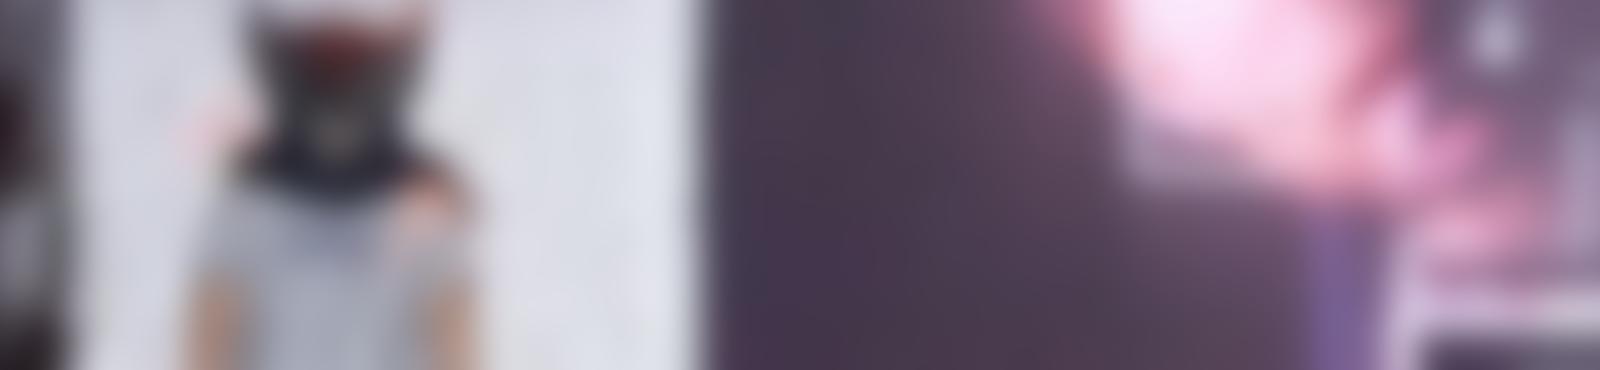 Blurred b3c9281e 1866 4f4e a81b 9d2e07bfe2bd